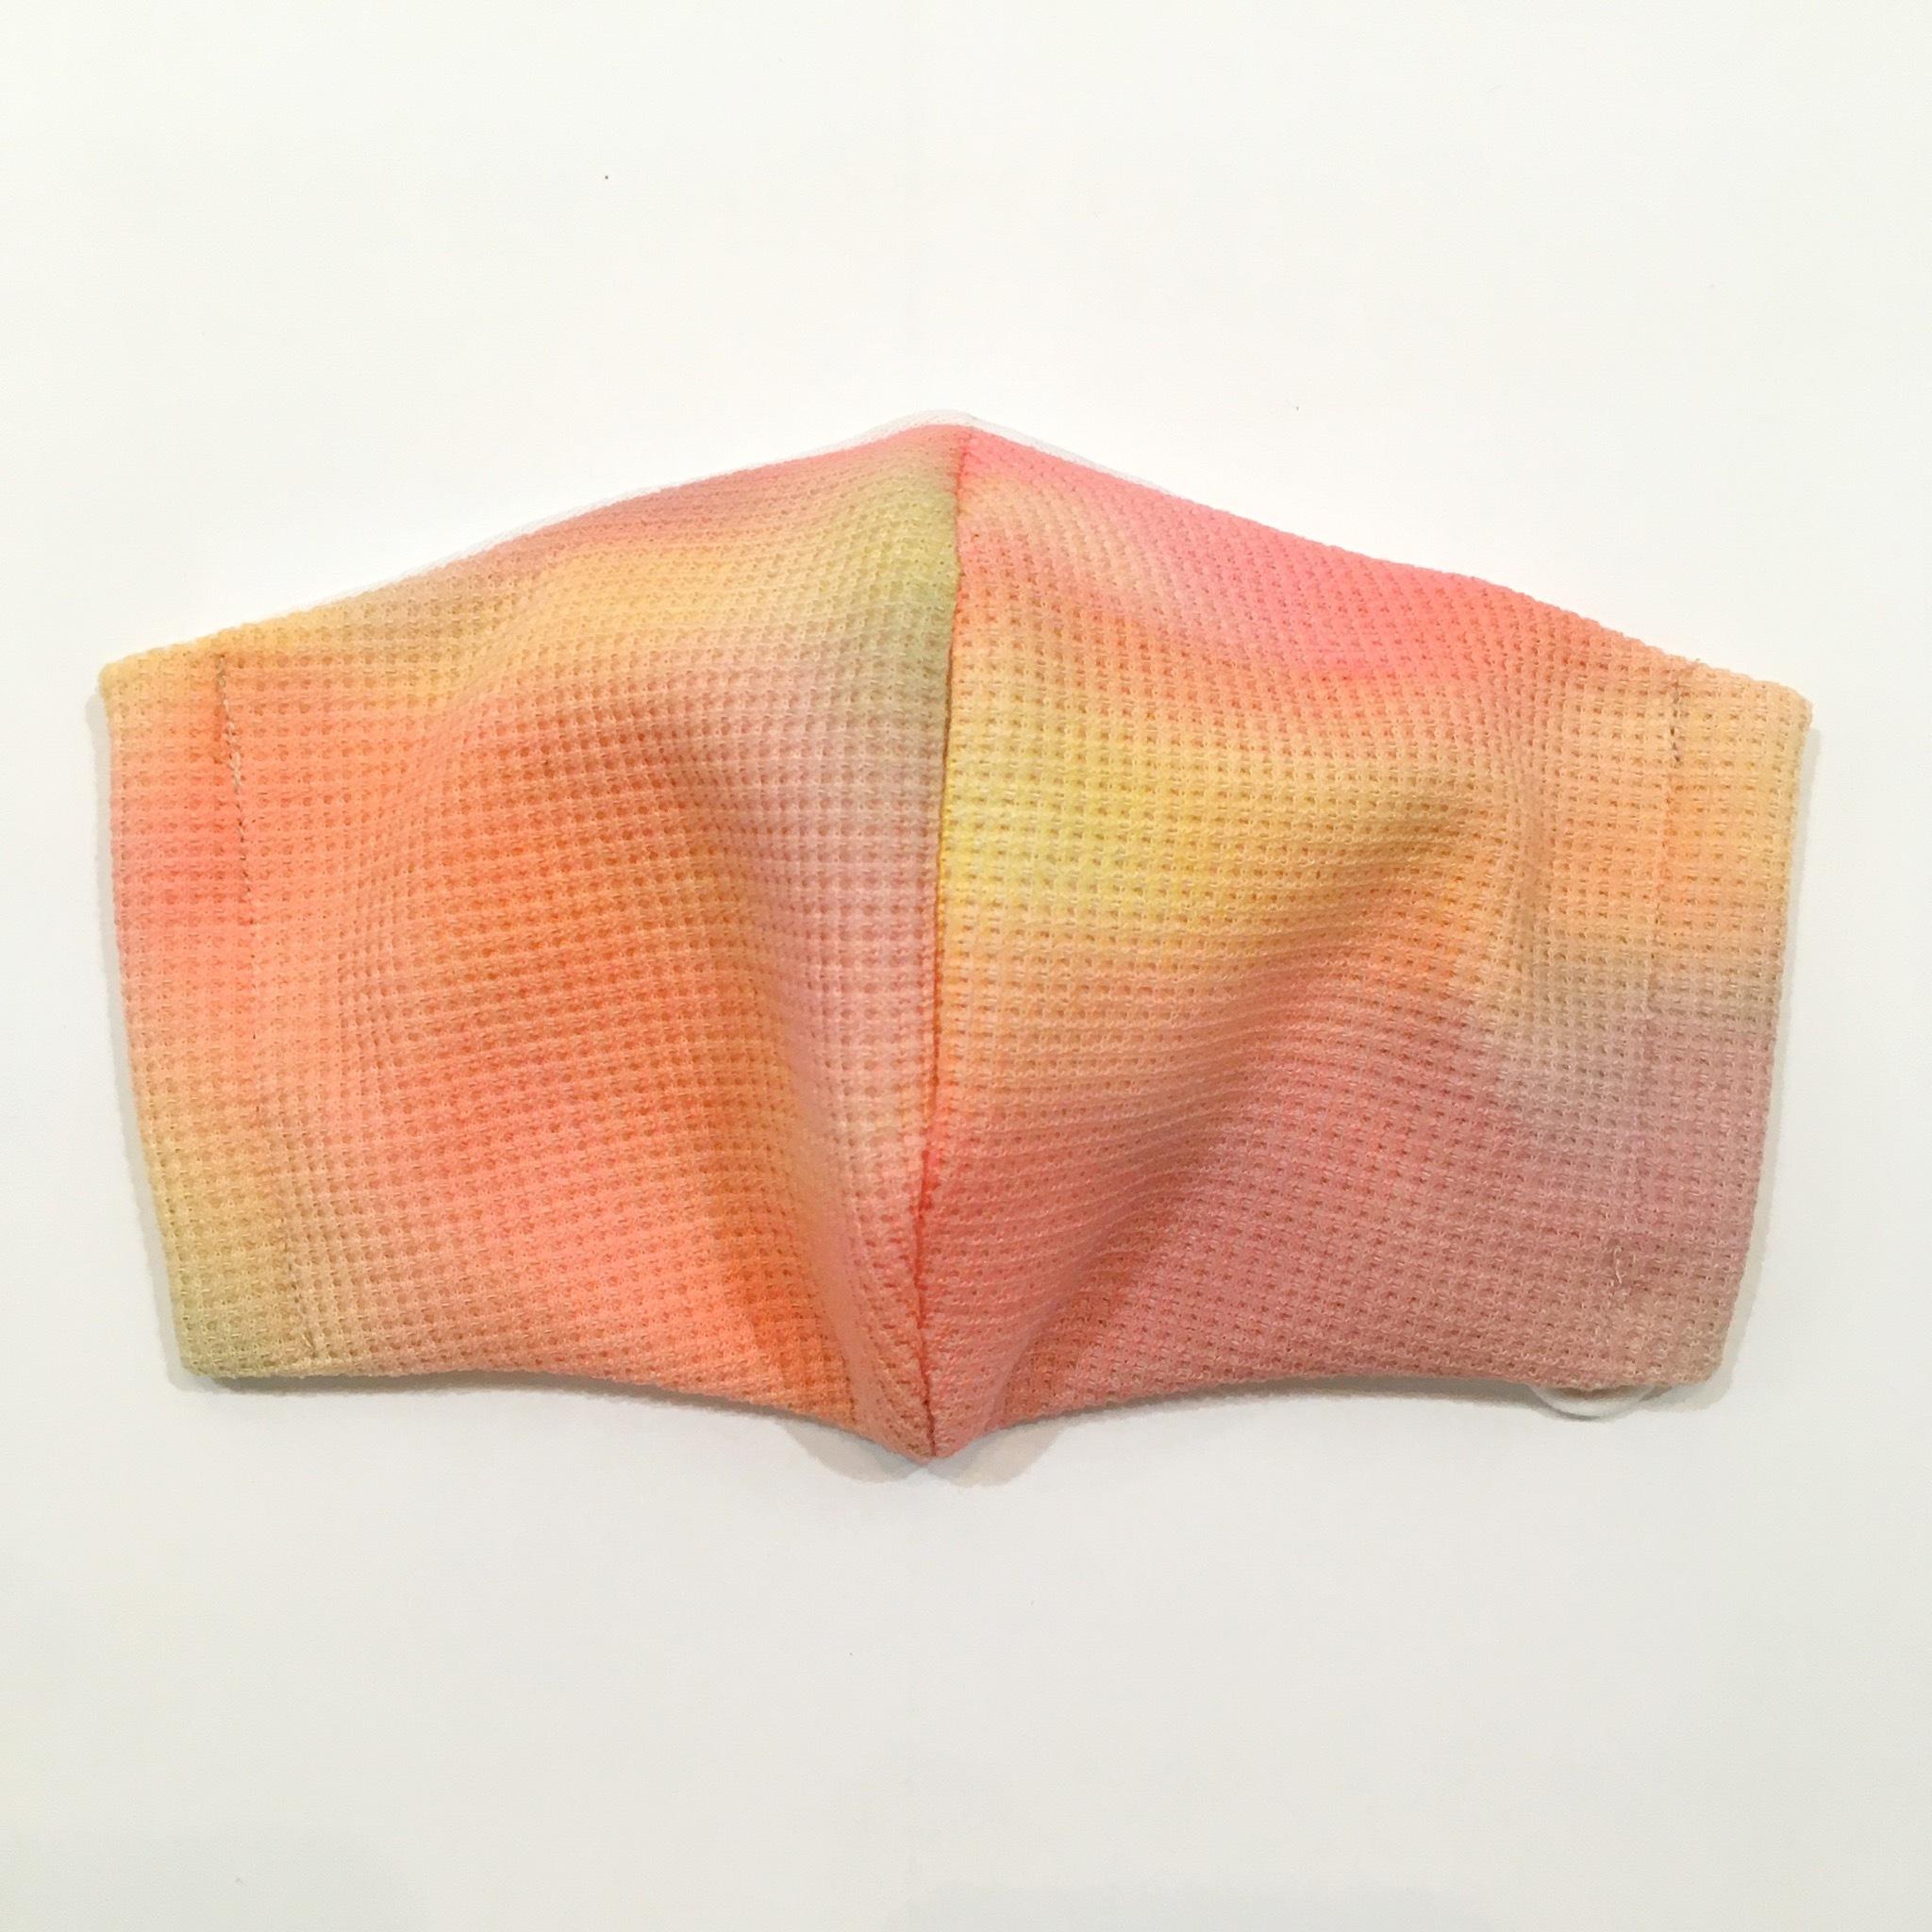 【HOLLYGRANTPATTERN】手染めの立体布マスク(オレンジ)UVカット